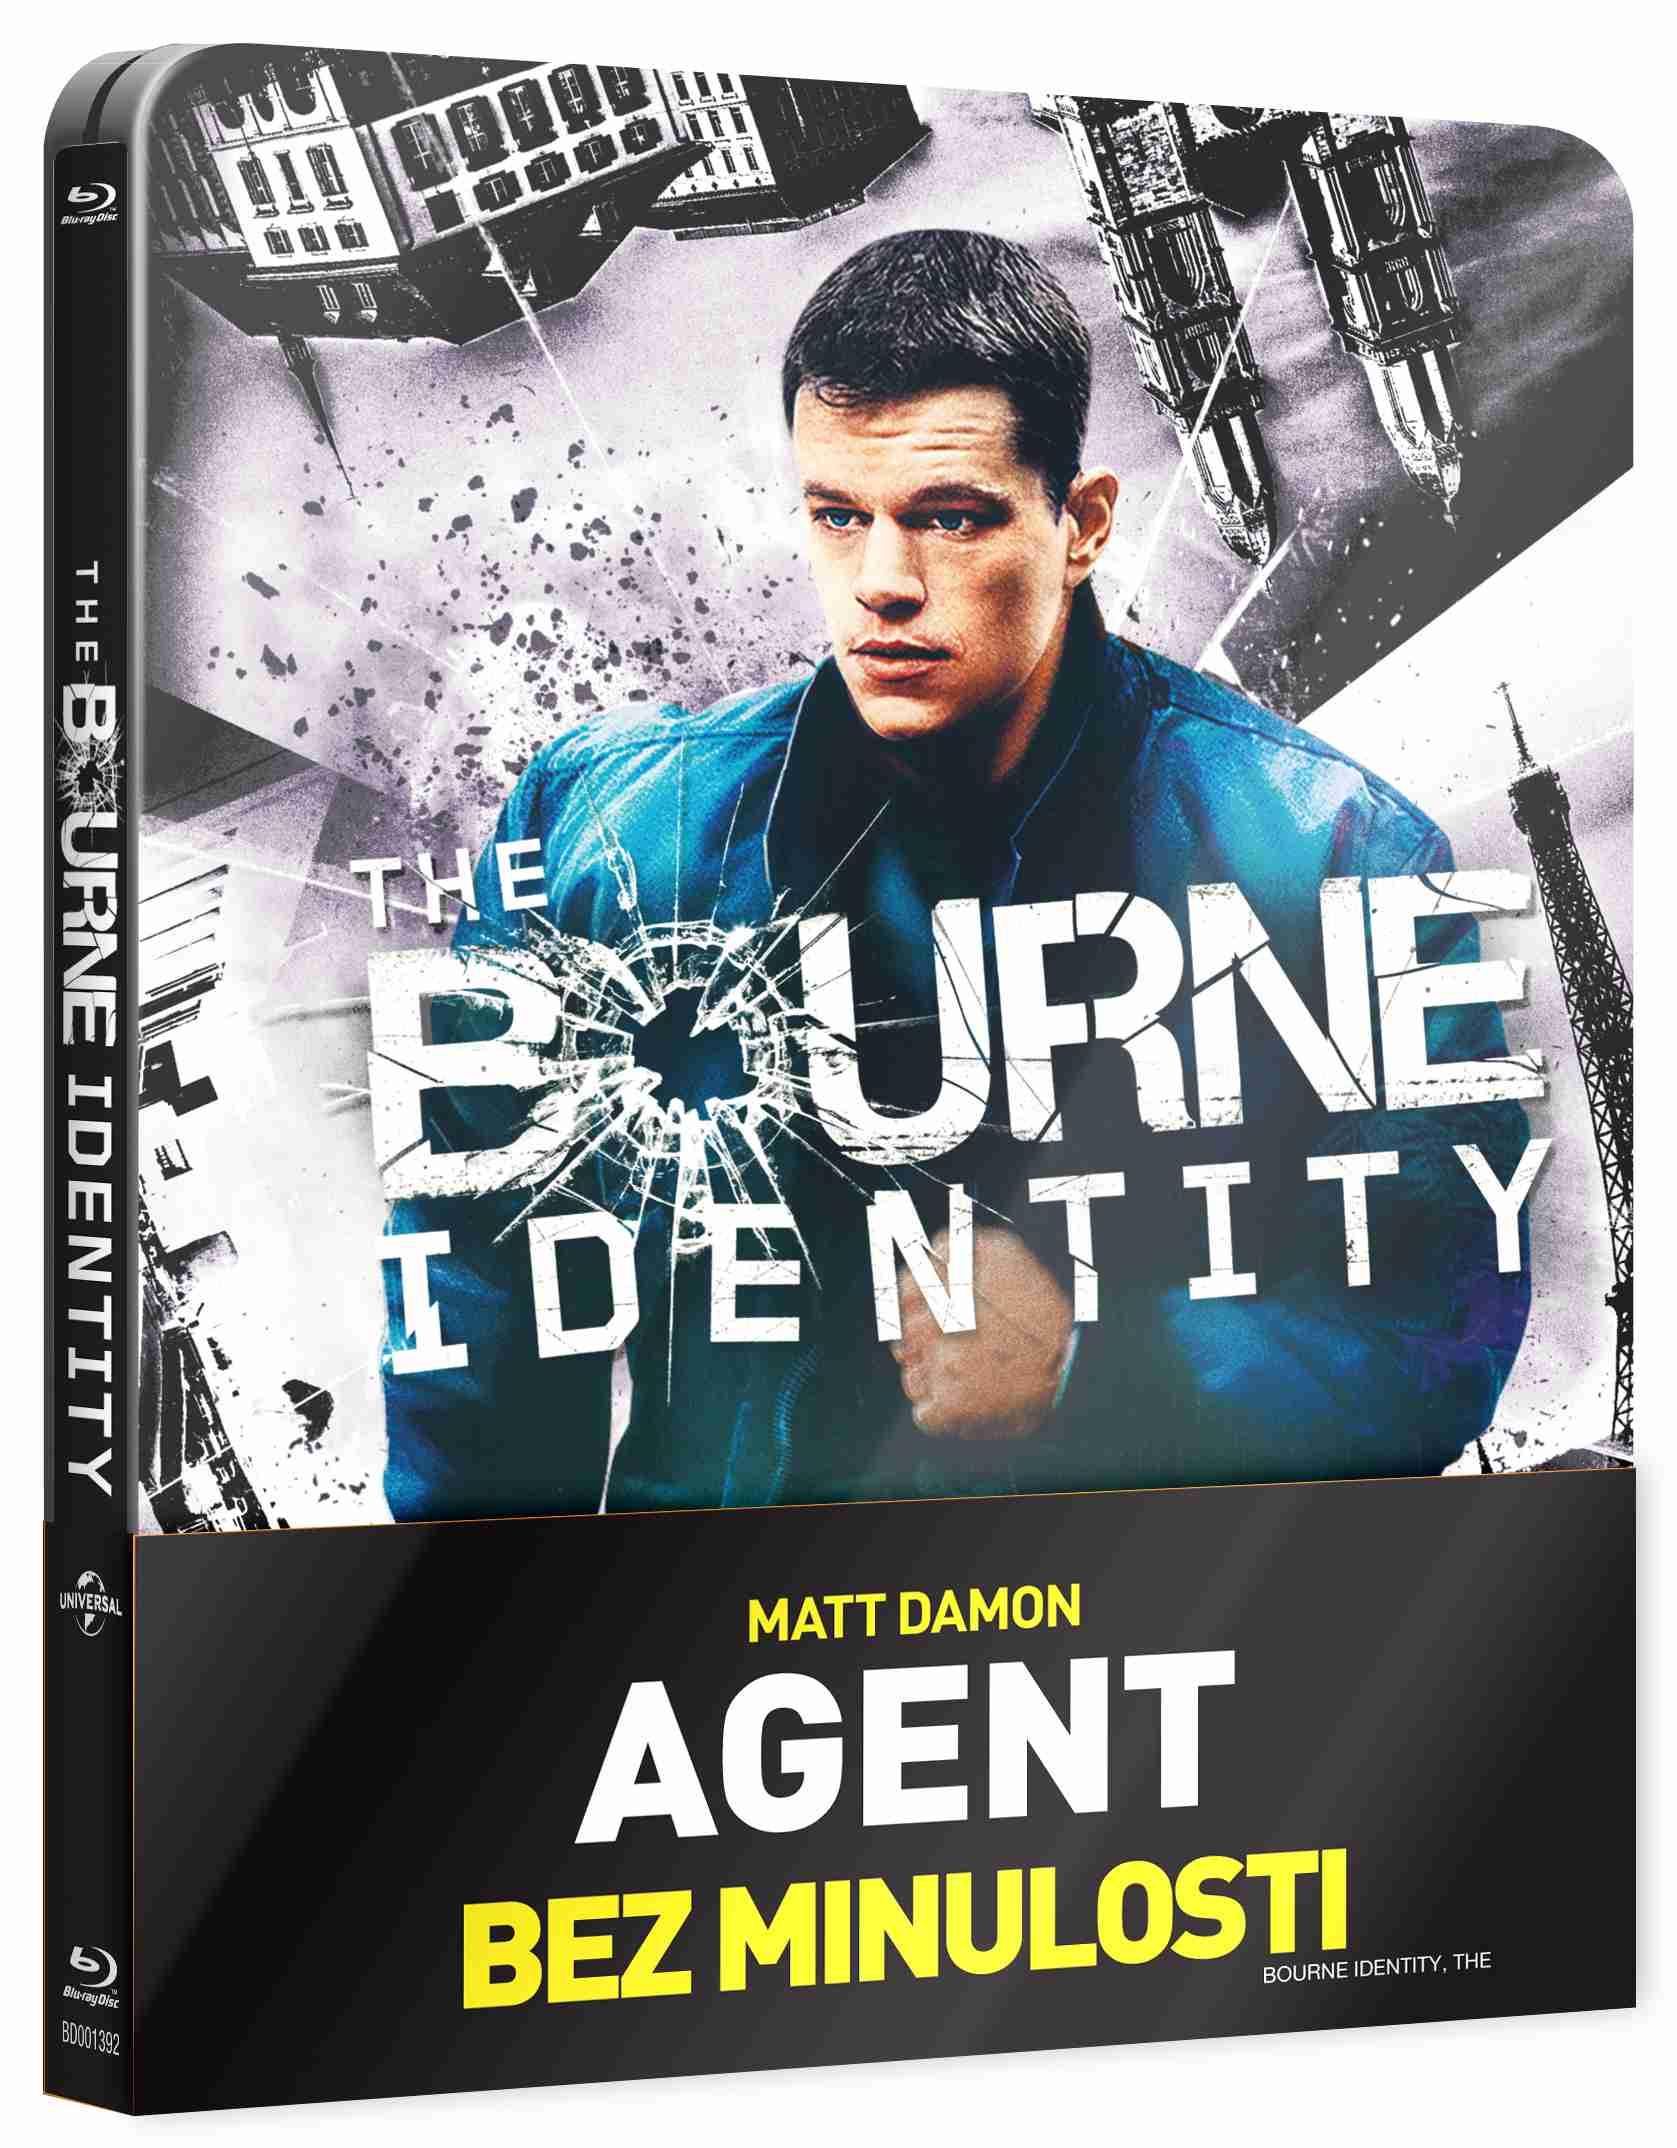 AGENT BEZ MINULOSTI - Blu-ray STEELBOOK